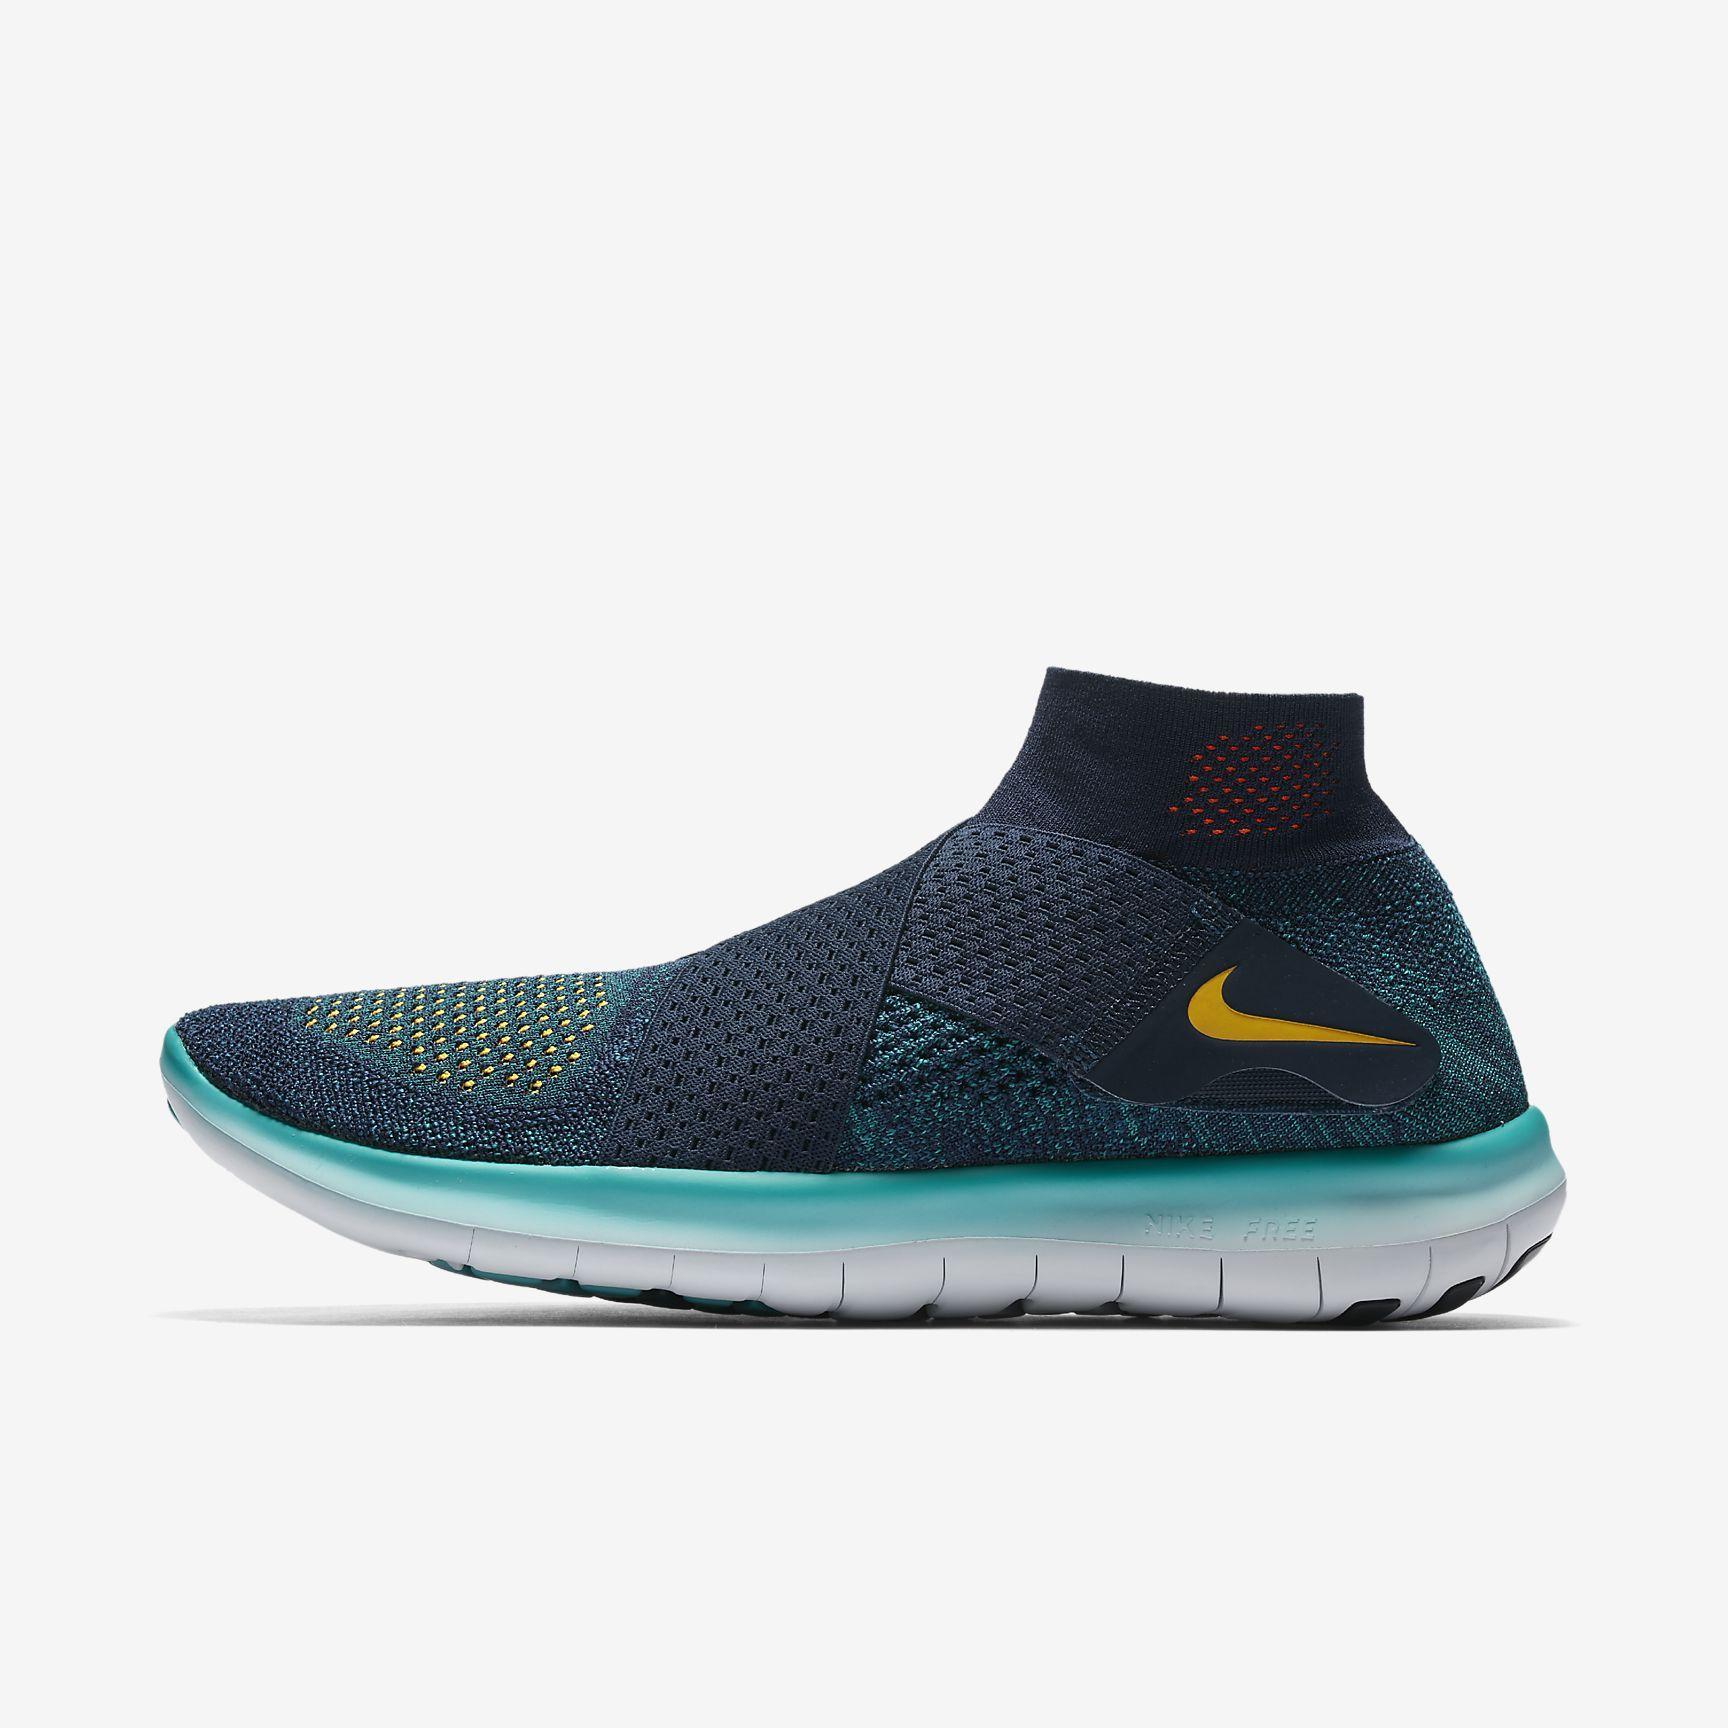 Nike Free RN Motion Flyknit 2017 Men's Running Shoe